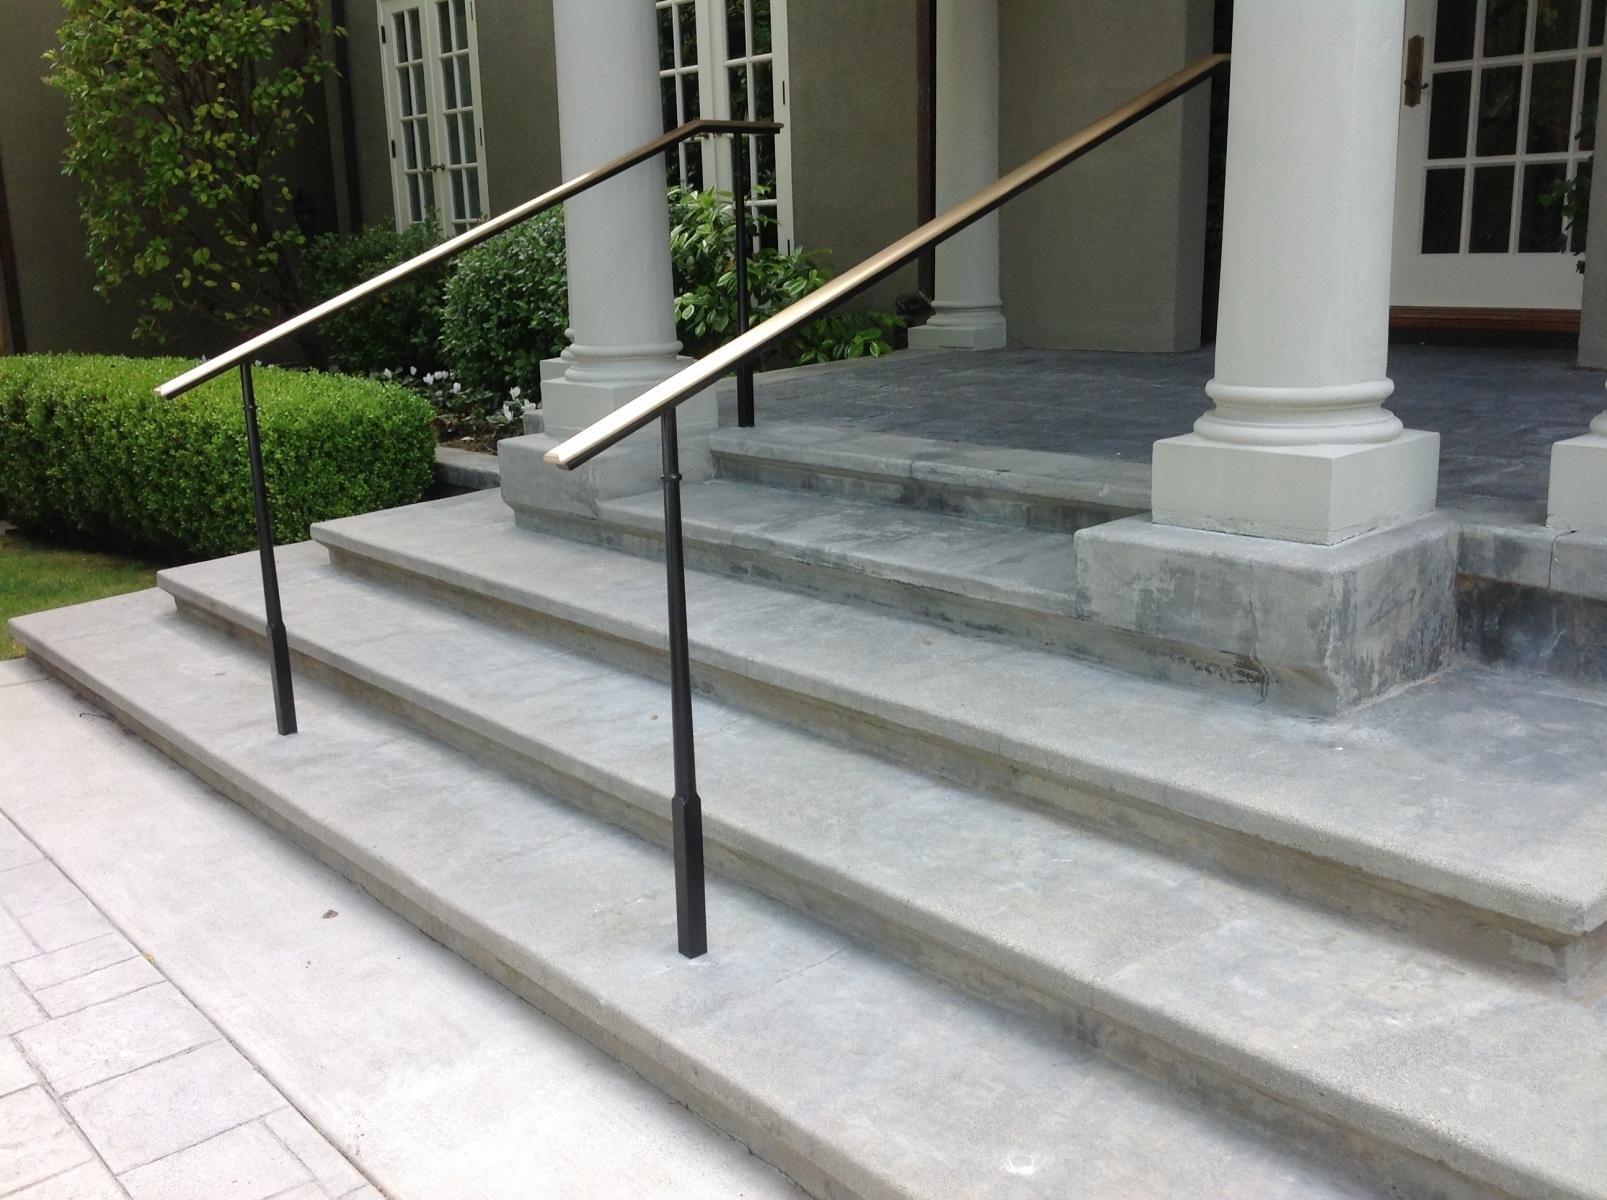 stairrailinghandrail0008